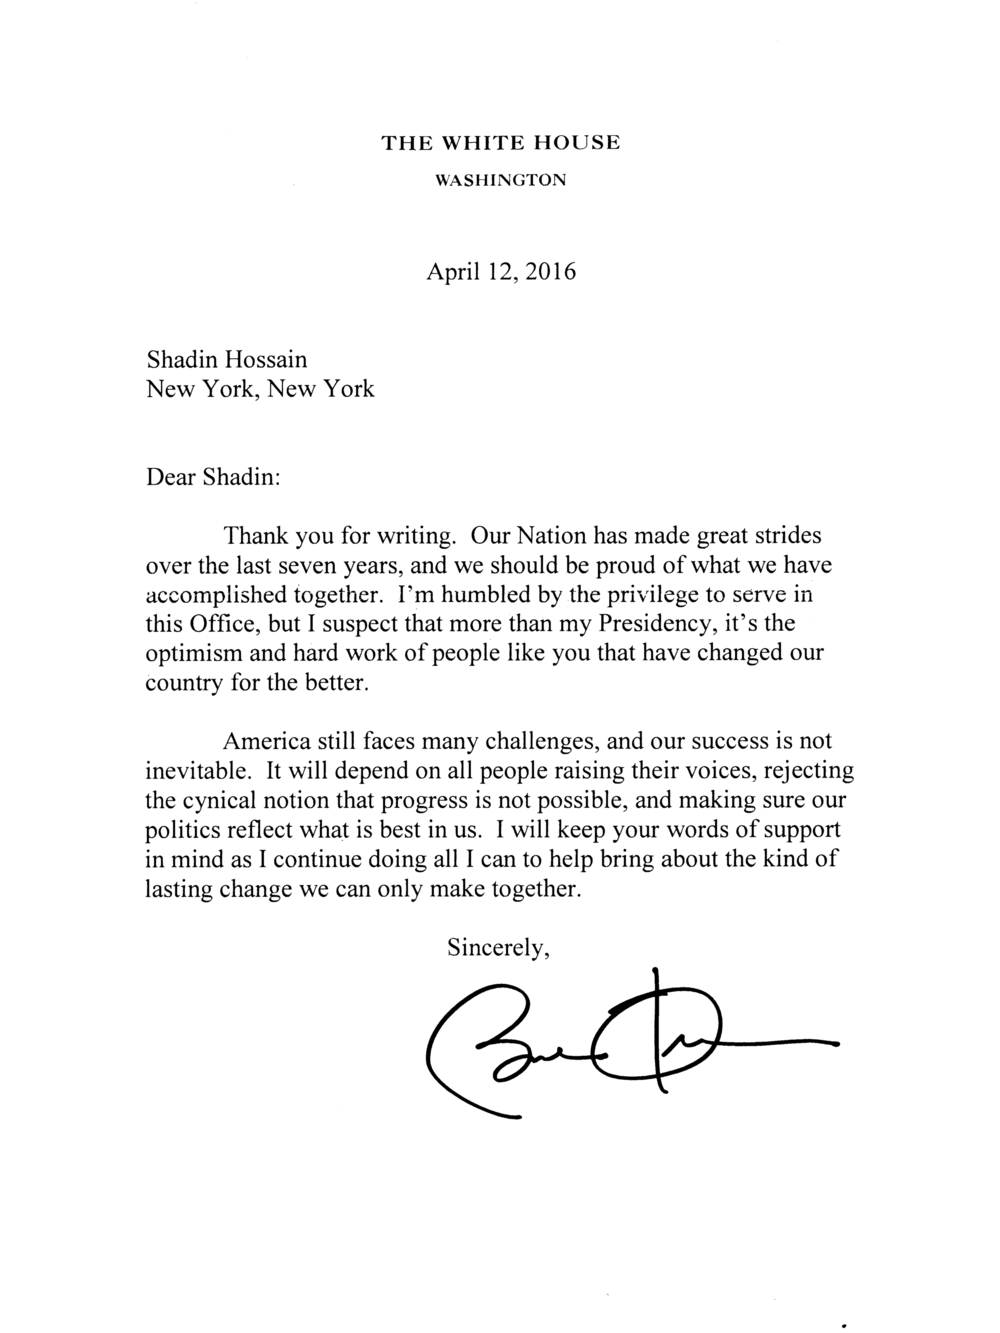 From Barack Obama